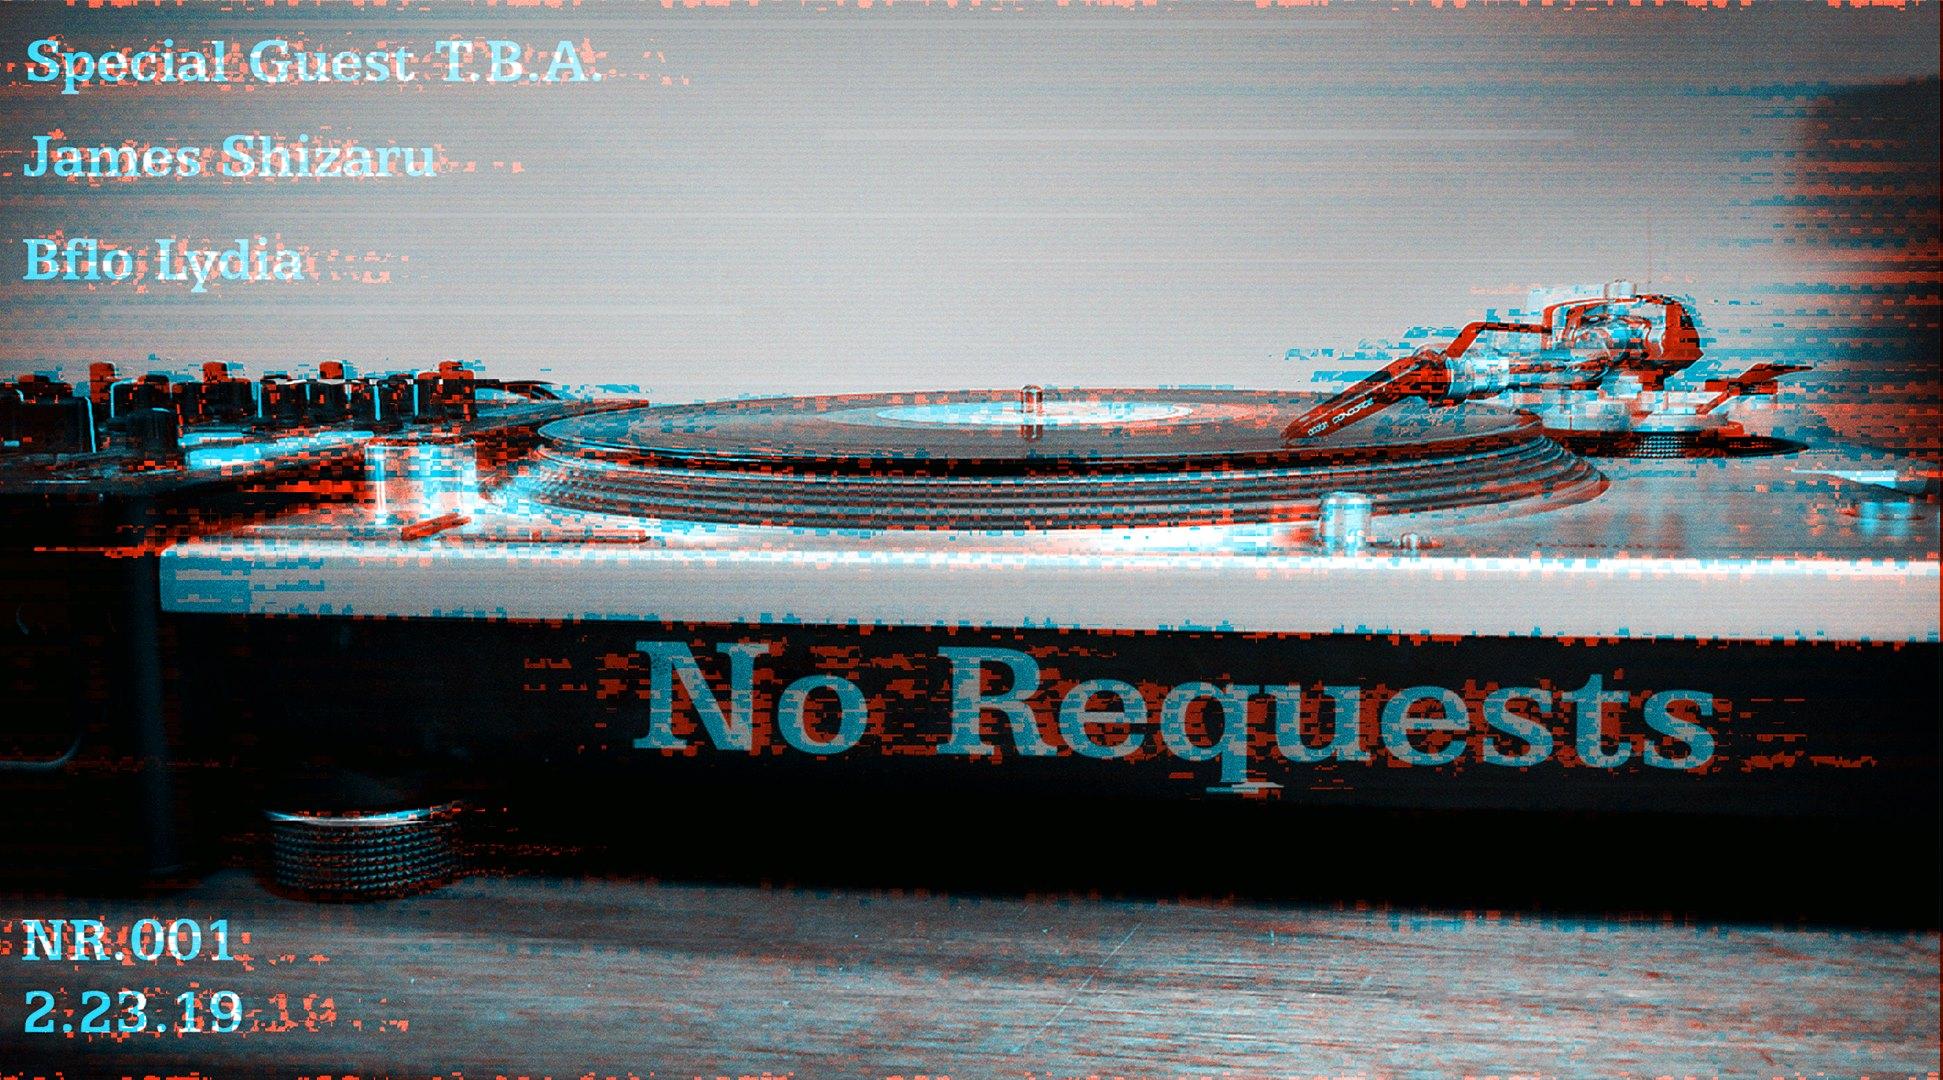 NO_REQUESTS